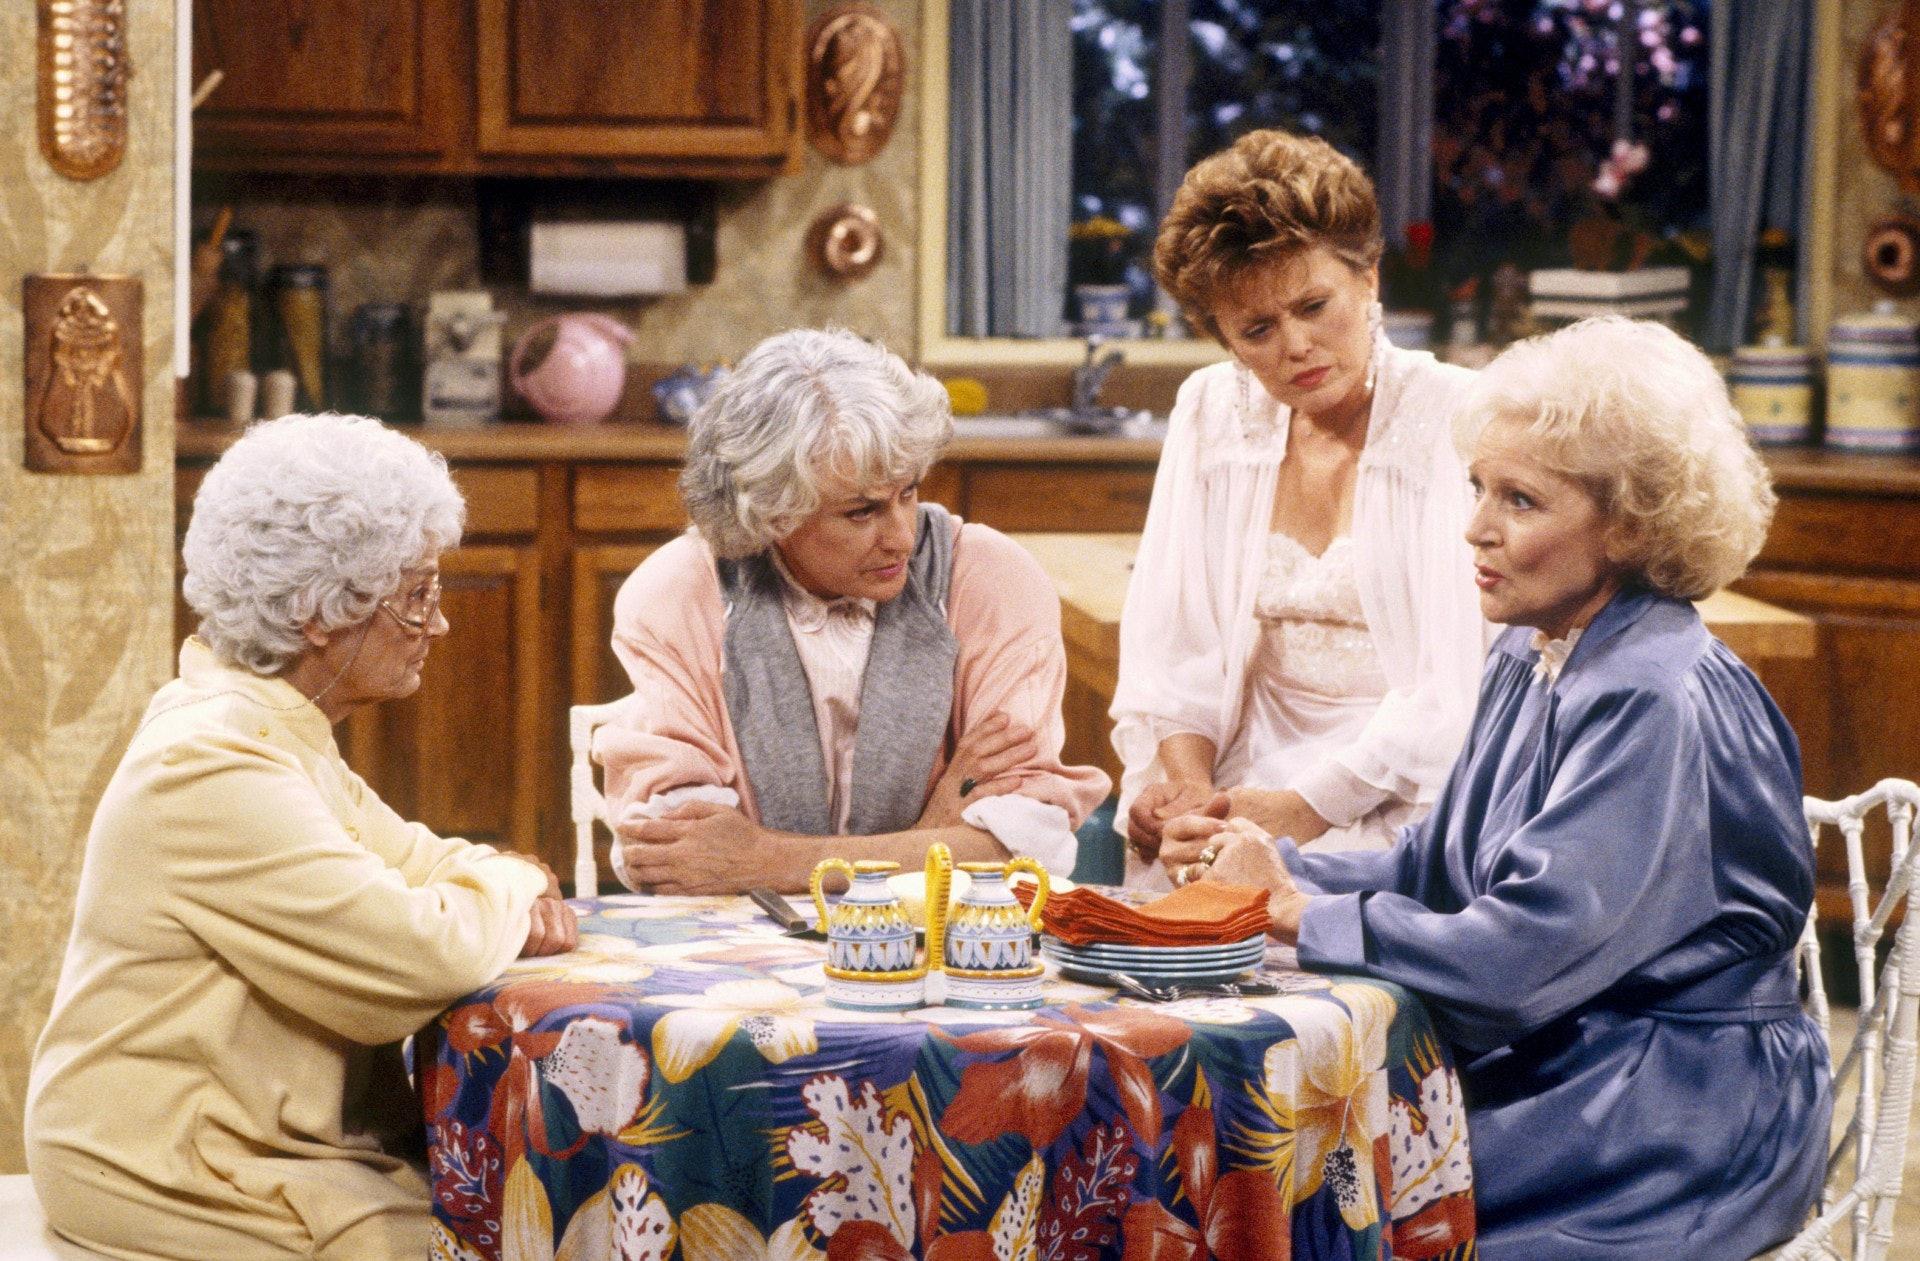 For 'Golden Girls' star Betty White; turning 95 and still employed